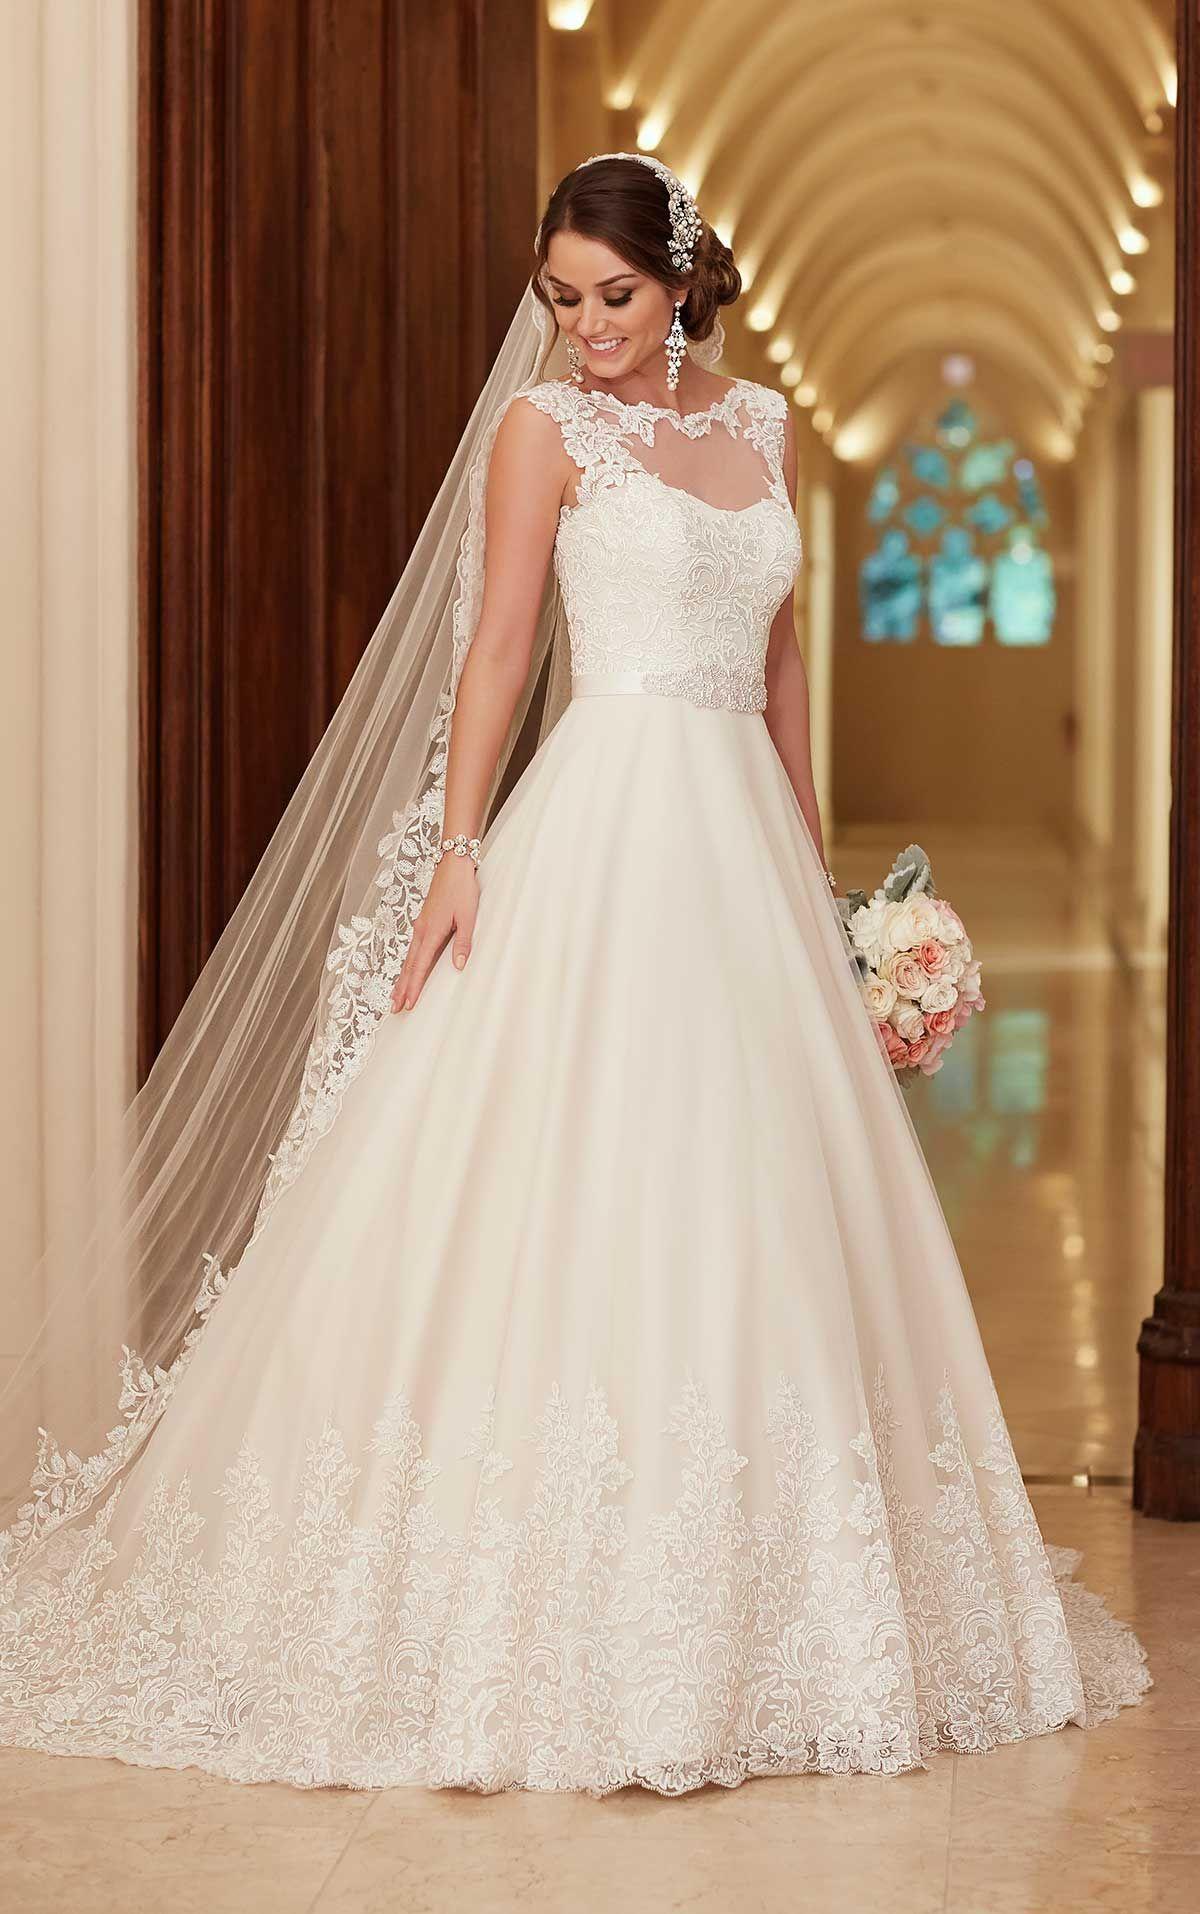 Traditional Lace Wedding Dress with Train   Pinterest   Stella york ...